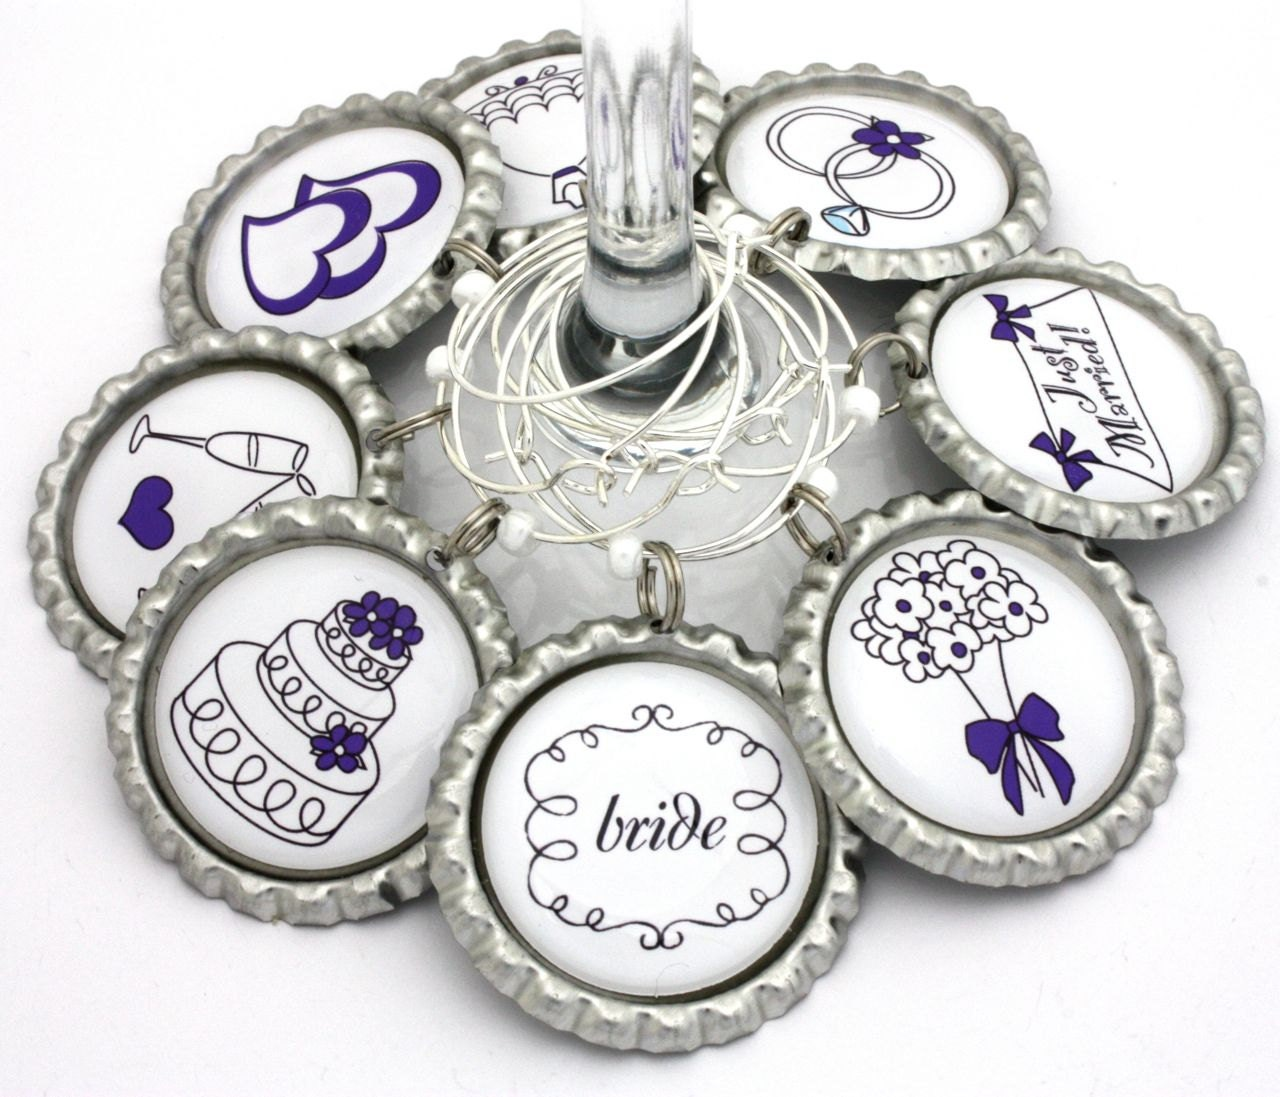 wine charms bridal shower favors - 28 images - bridal shower favors ...